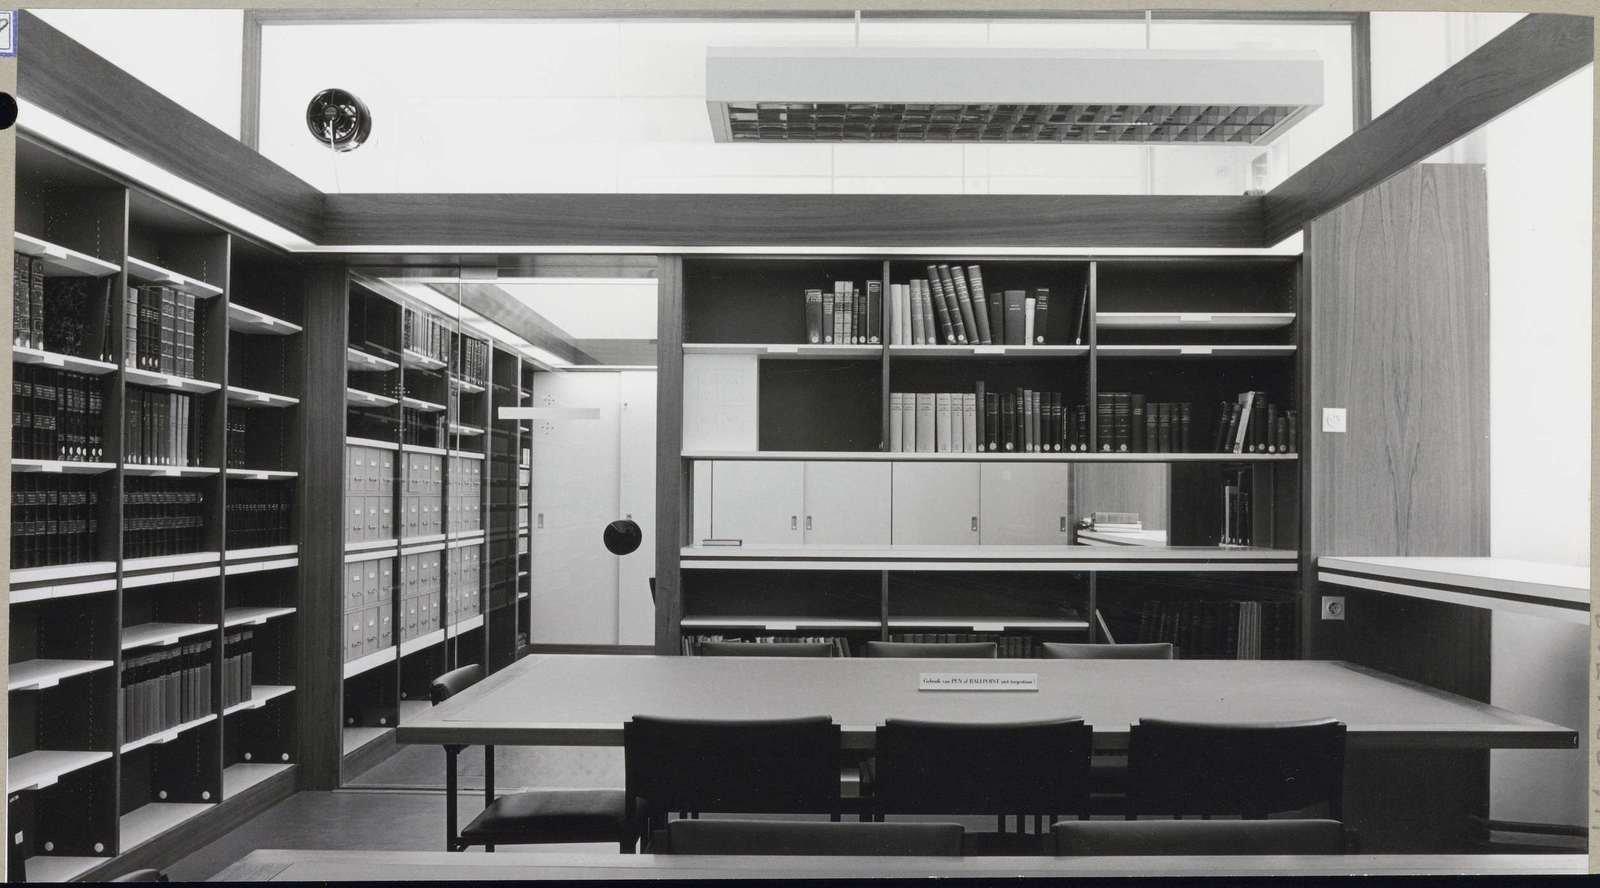 Renovated study room at the Rijksmuseum, 1967, anonymous, Rijksmuseum, Public Domain Mark